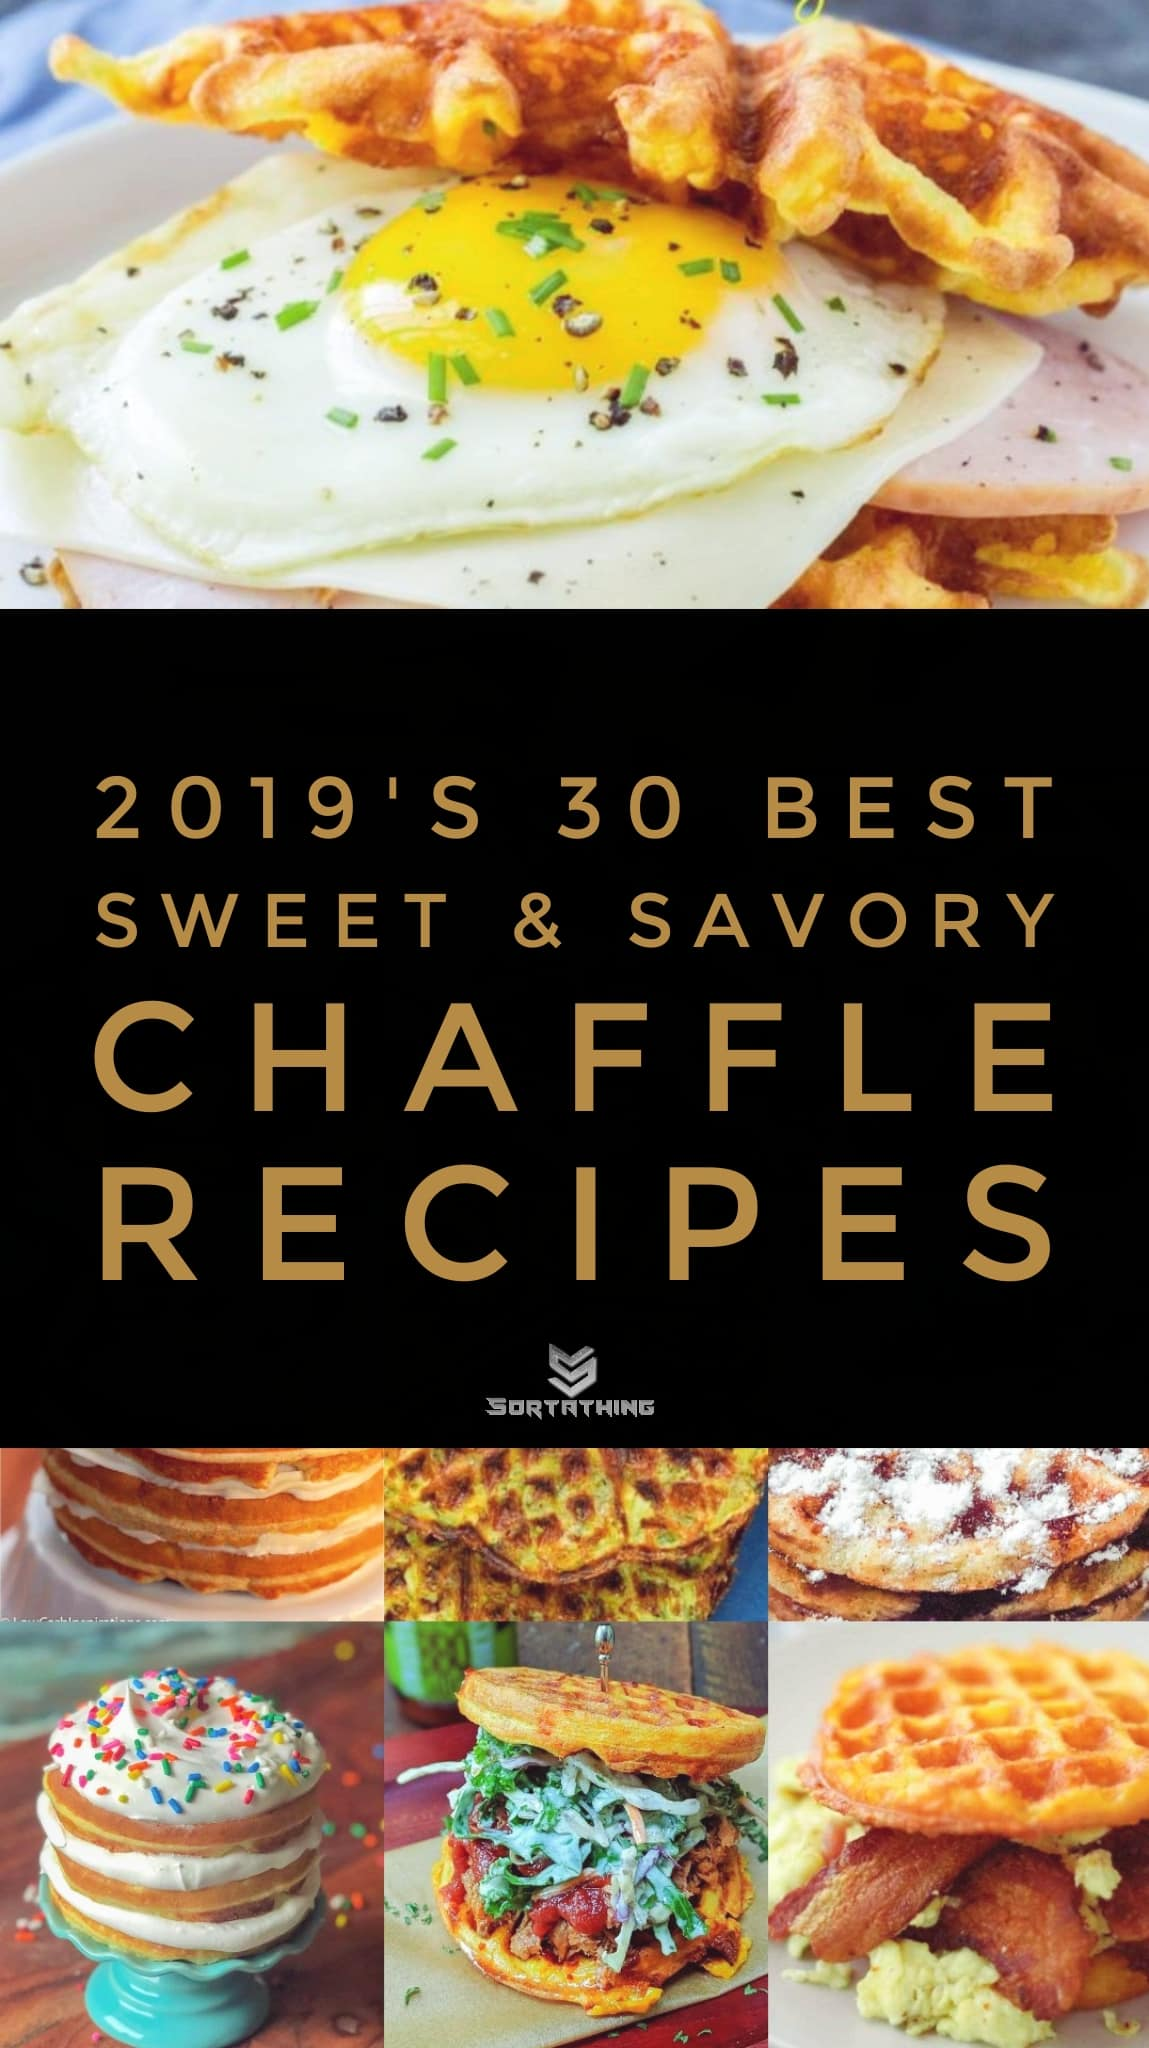 30 Best Chaffle Recipe - Sweet & Savory Keto Waffles